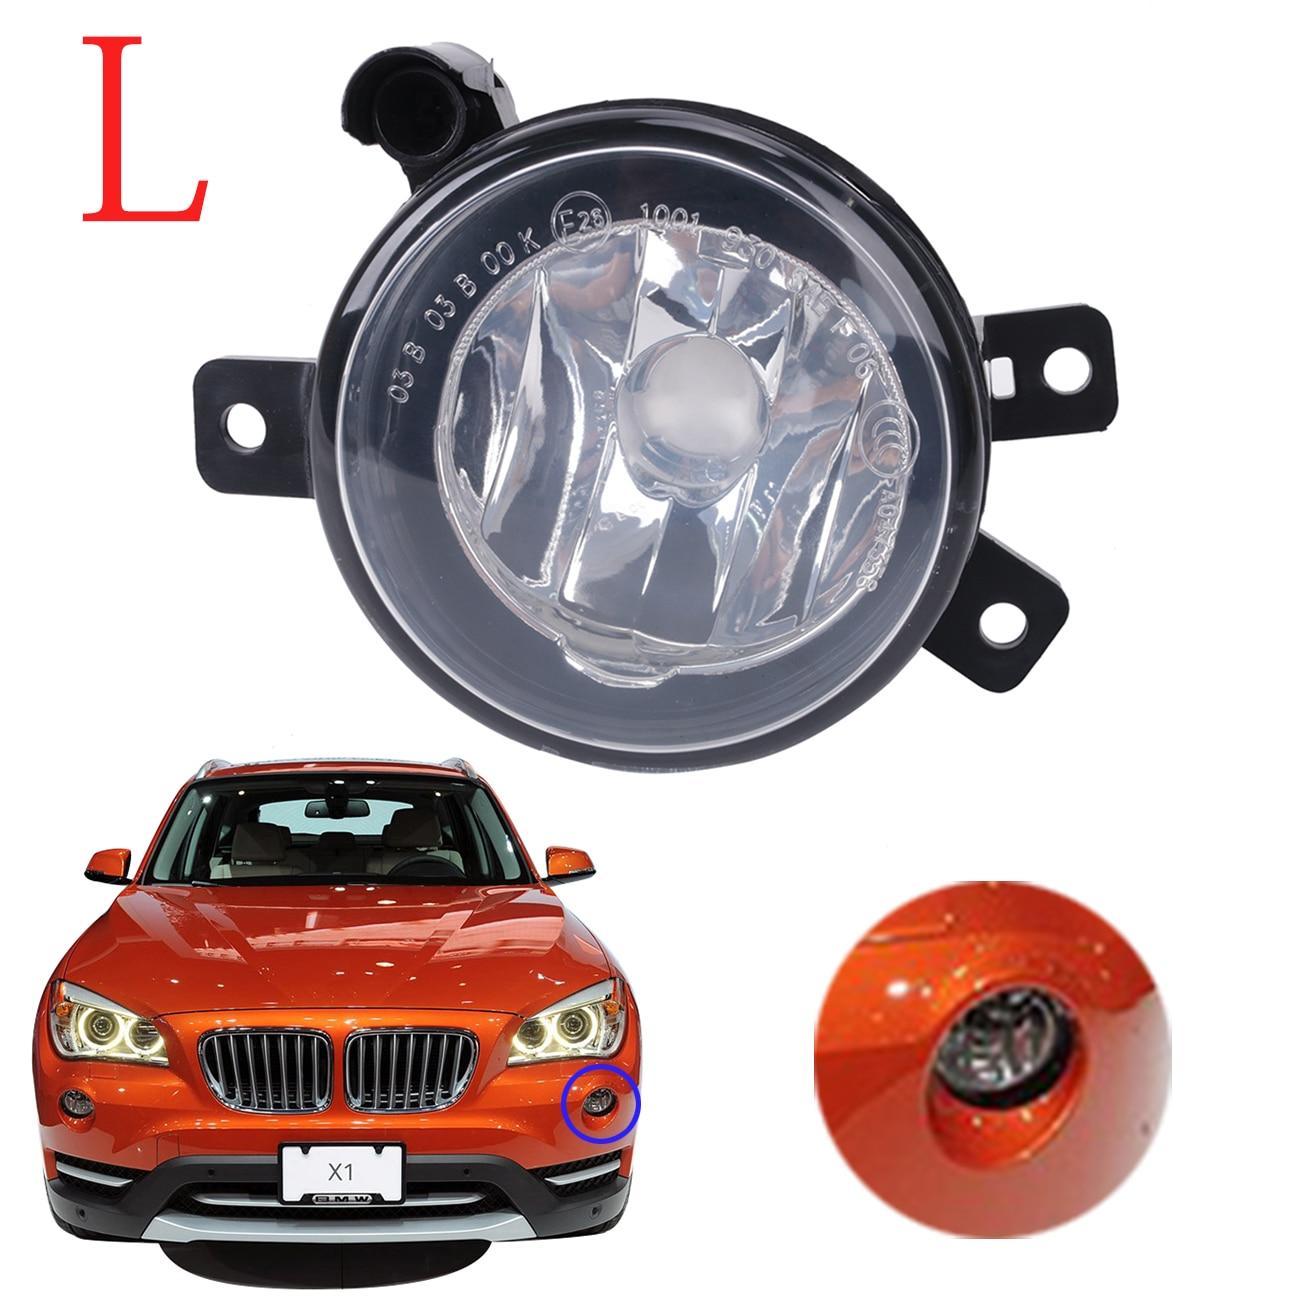 For BMW X1 E84 Sport Model 2010 - 2015 Front Foglight Fog Lights Clear Lamps Foglamp Covers OEM 63172993525 Left Side #W089-L<br>